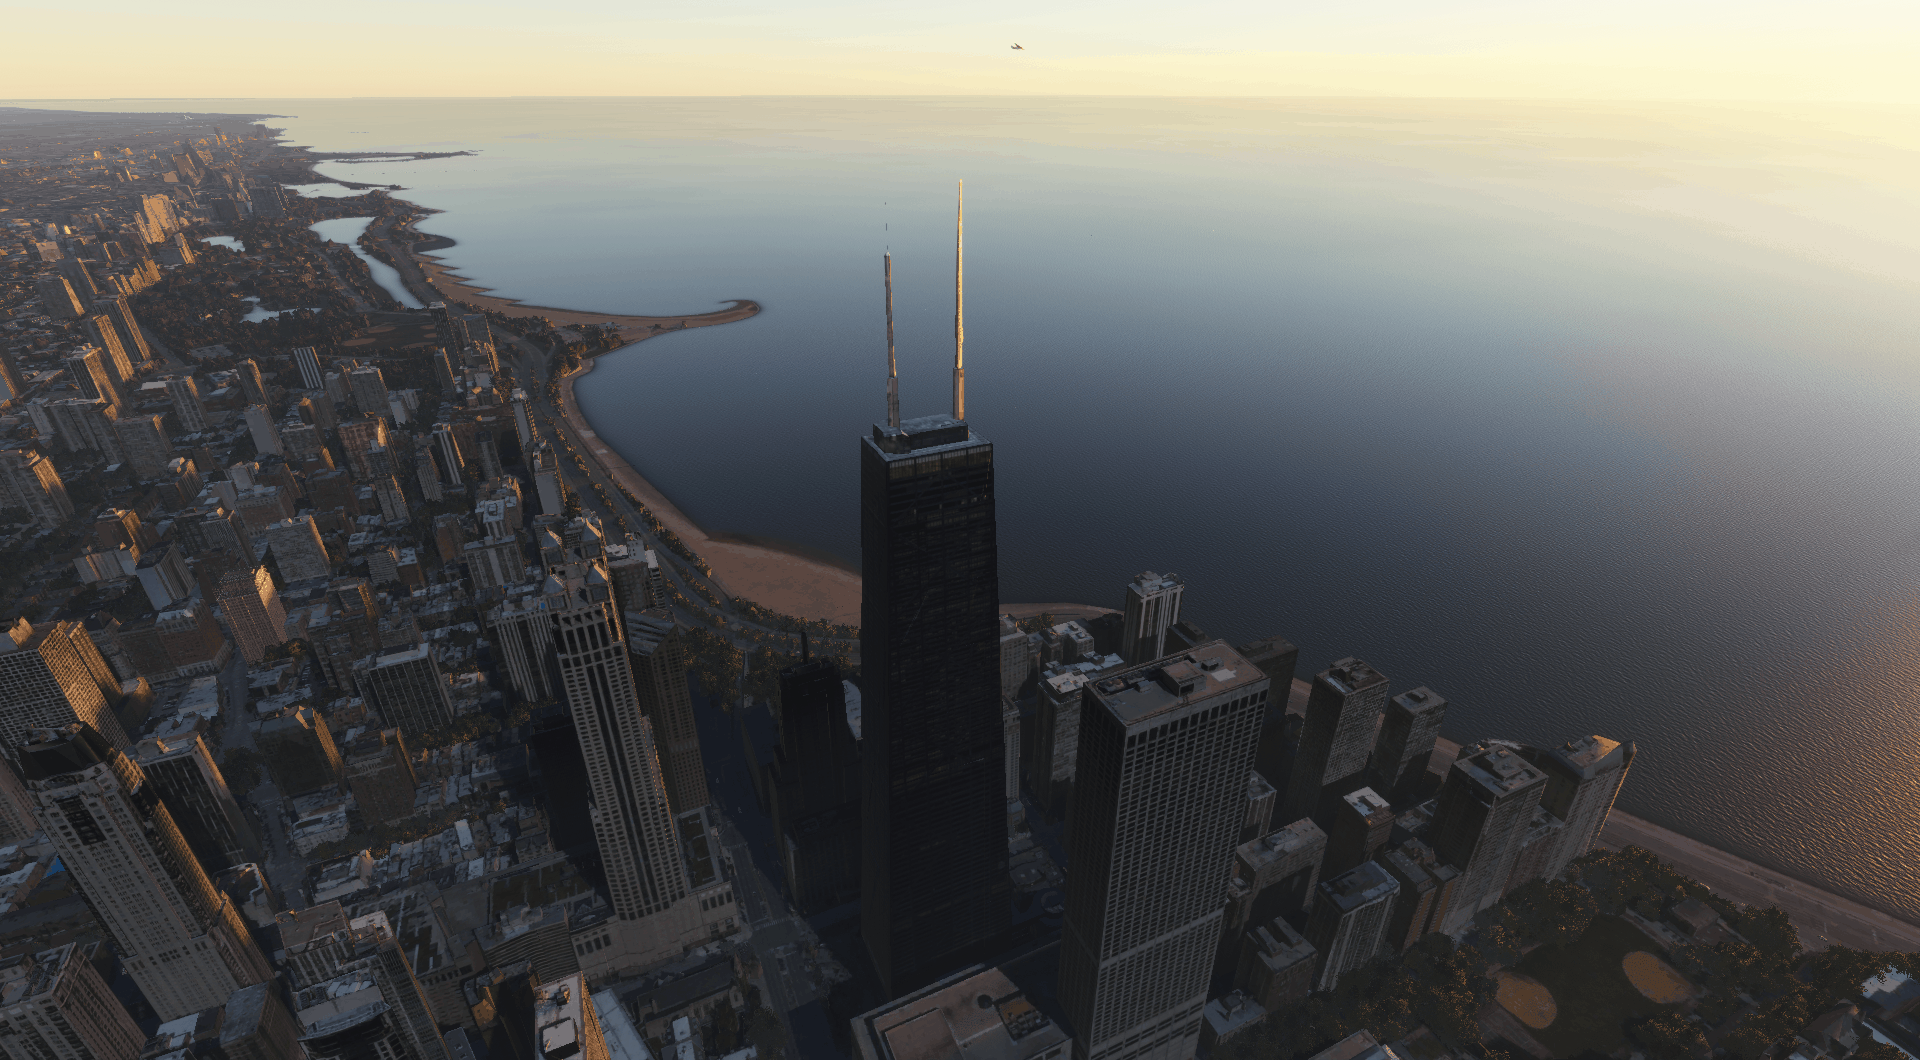 Chicago Enhanced Scenery - Microsoft Flight Simulator 2020 Mod